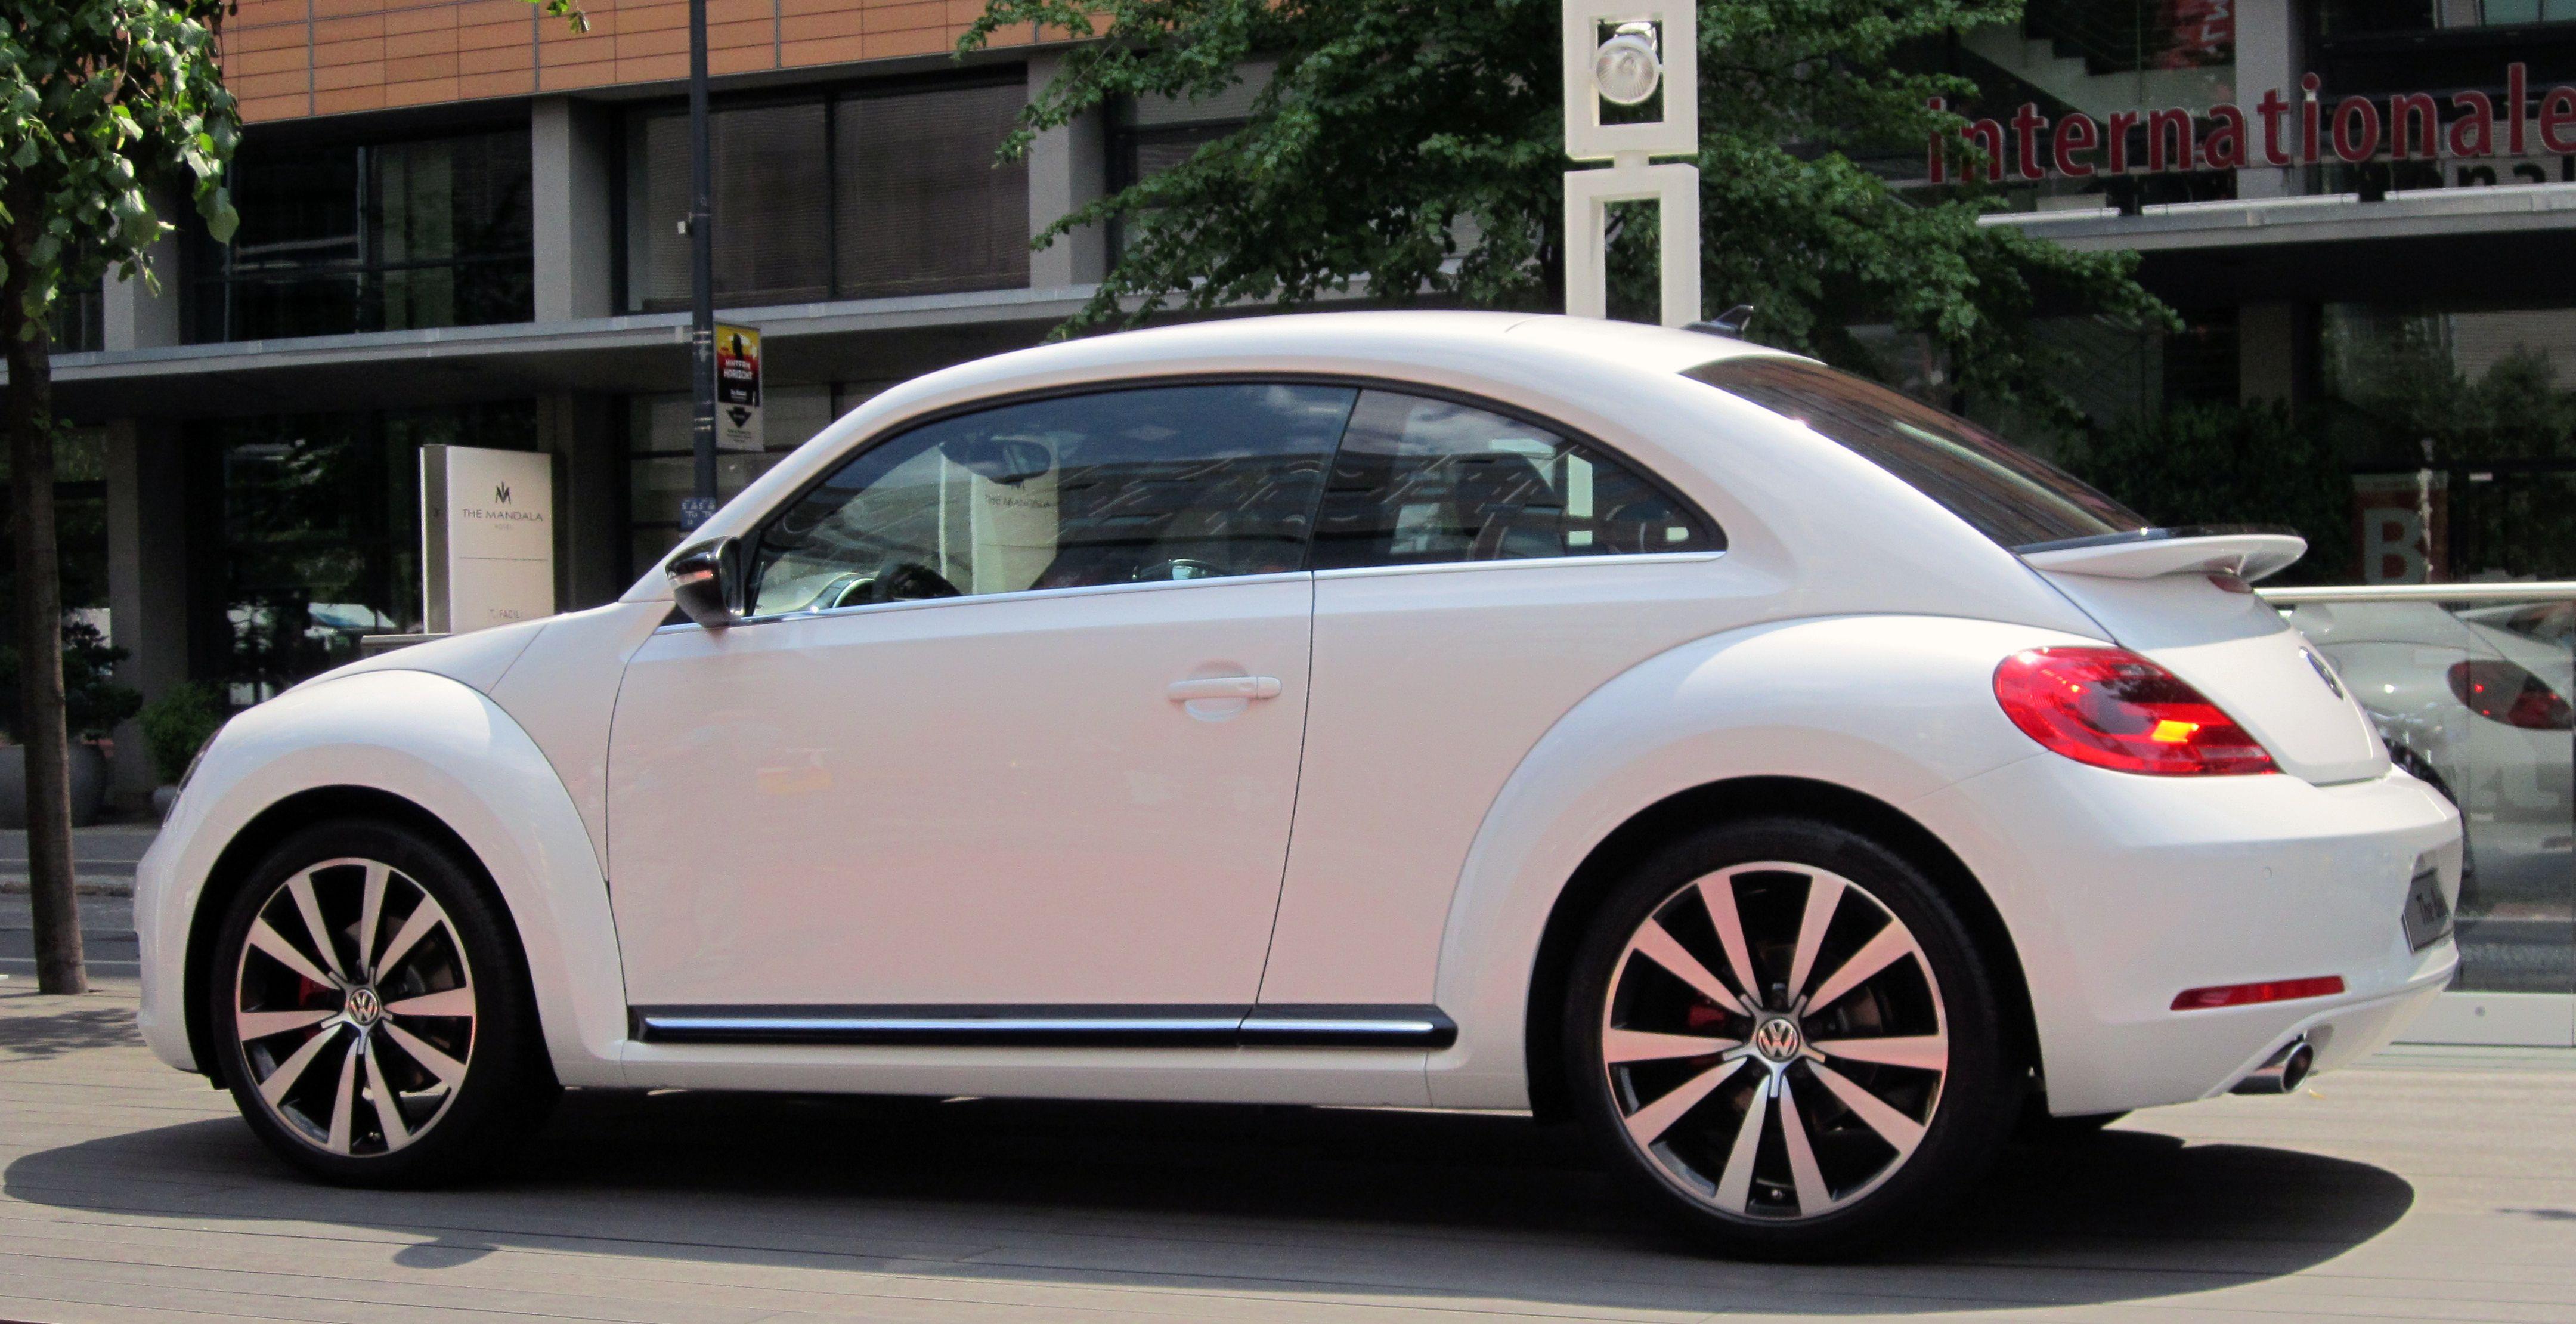 Images volkswagen coccinelle fender volkswagen coccinelle fender en - Volkswagen Debuts The Beetle Fender Edition